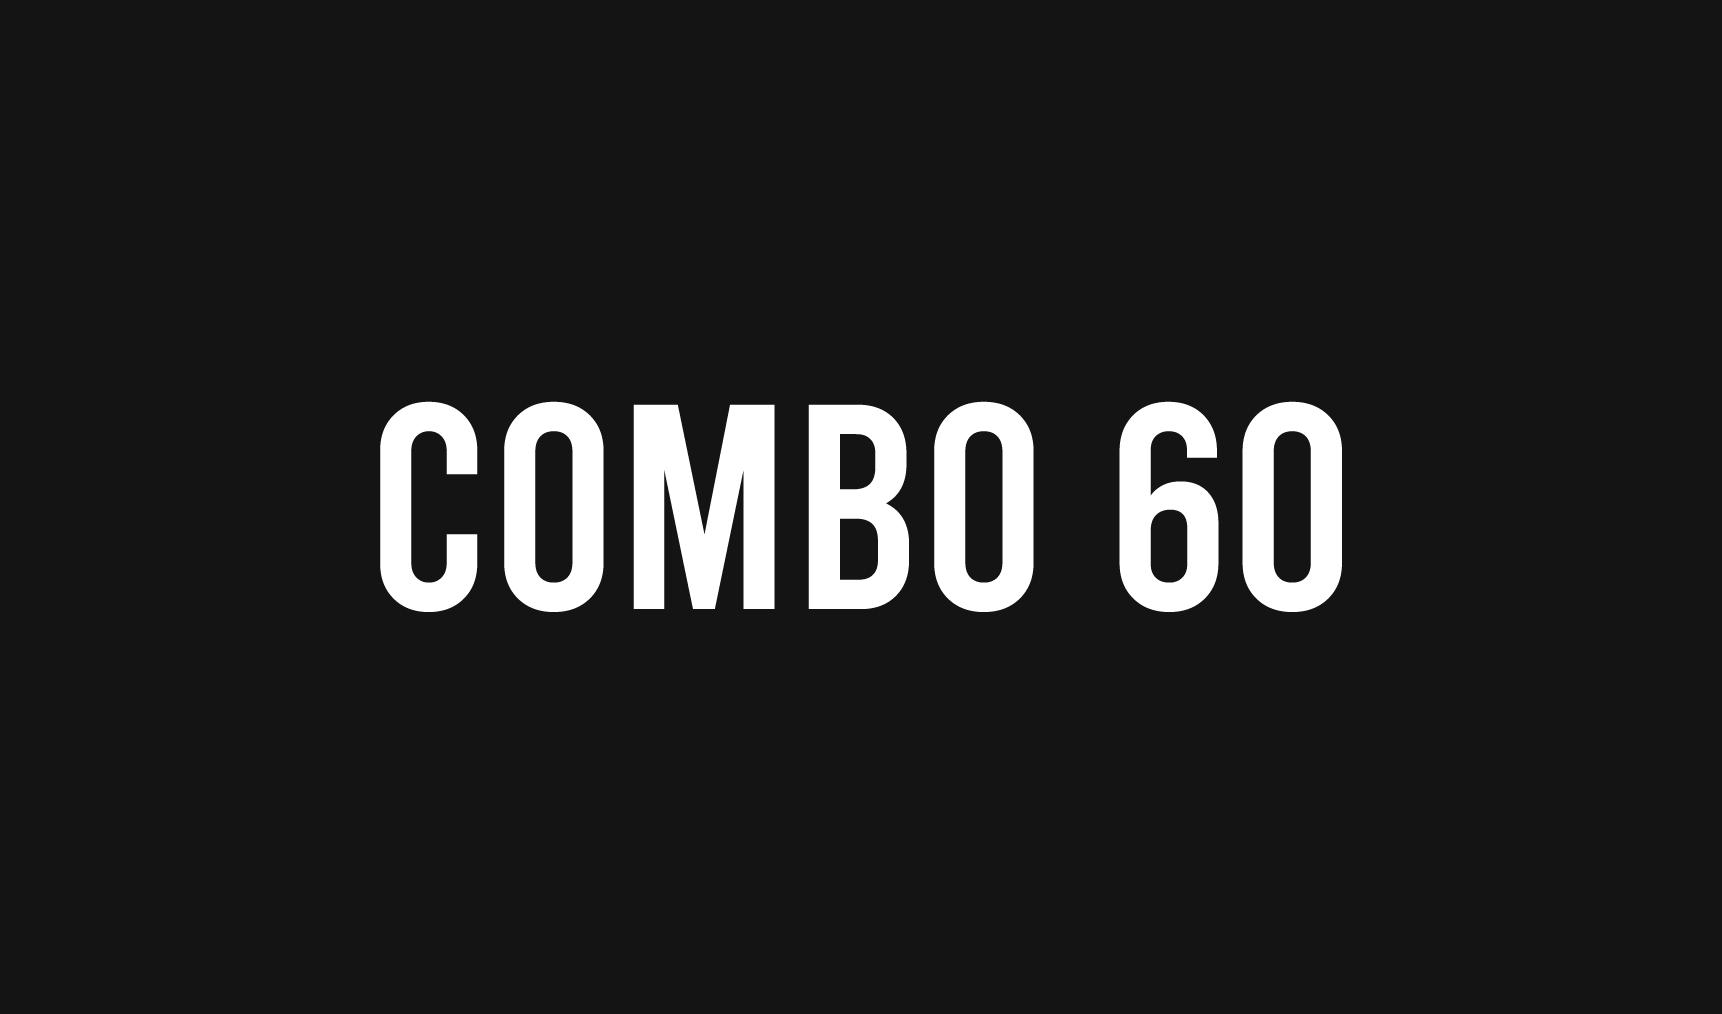 Combo 60